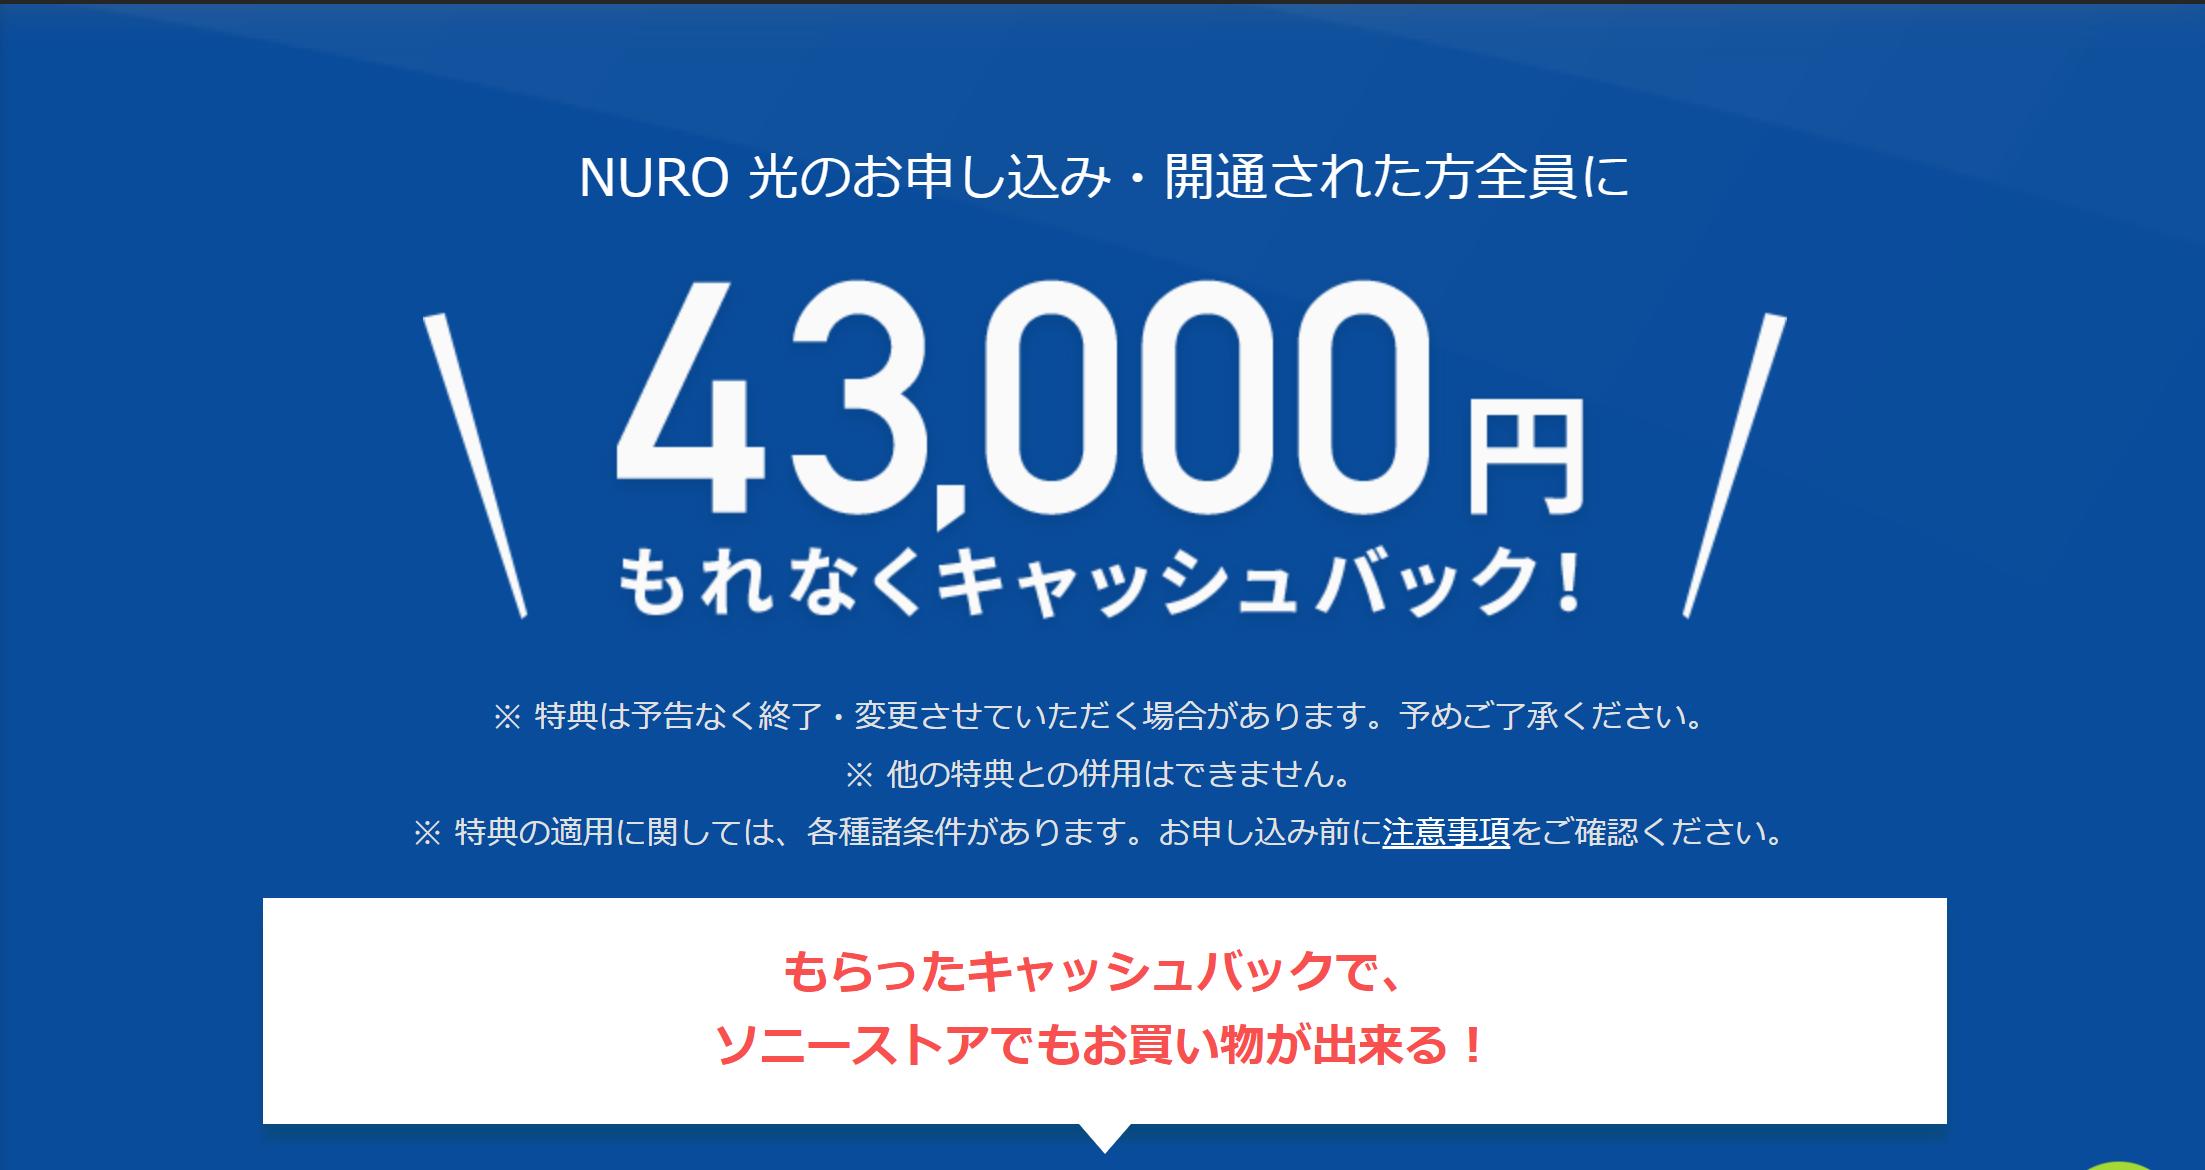 NURO光 キャンペーン 43000円